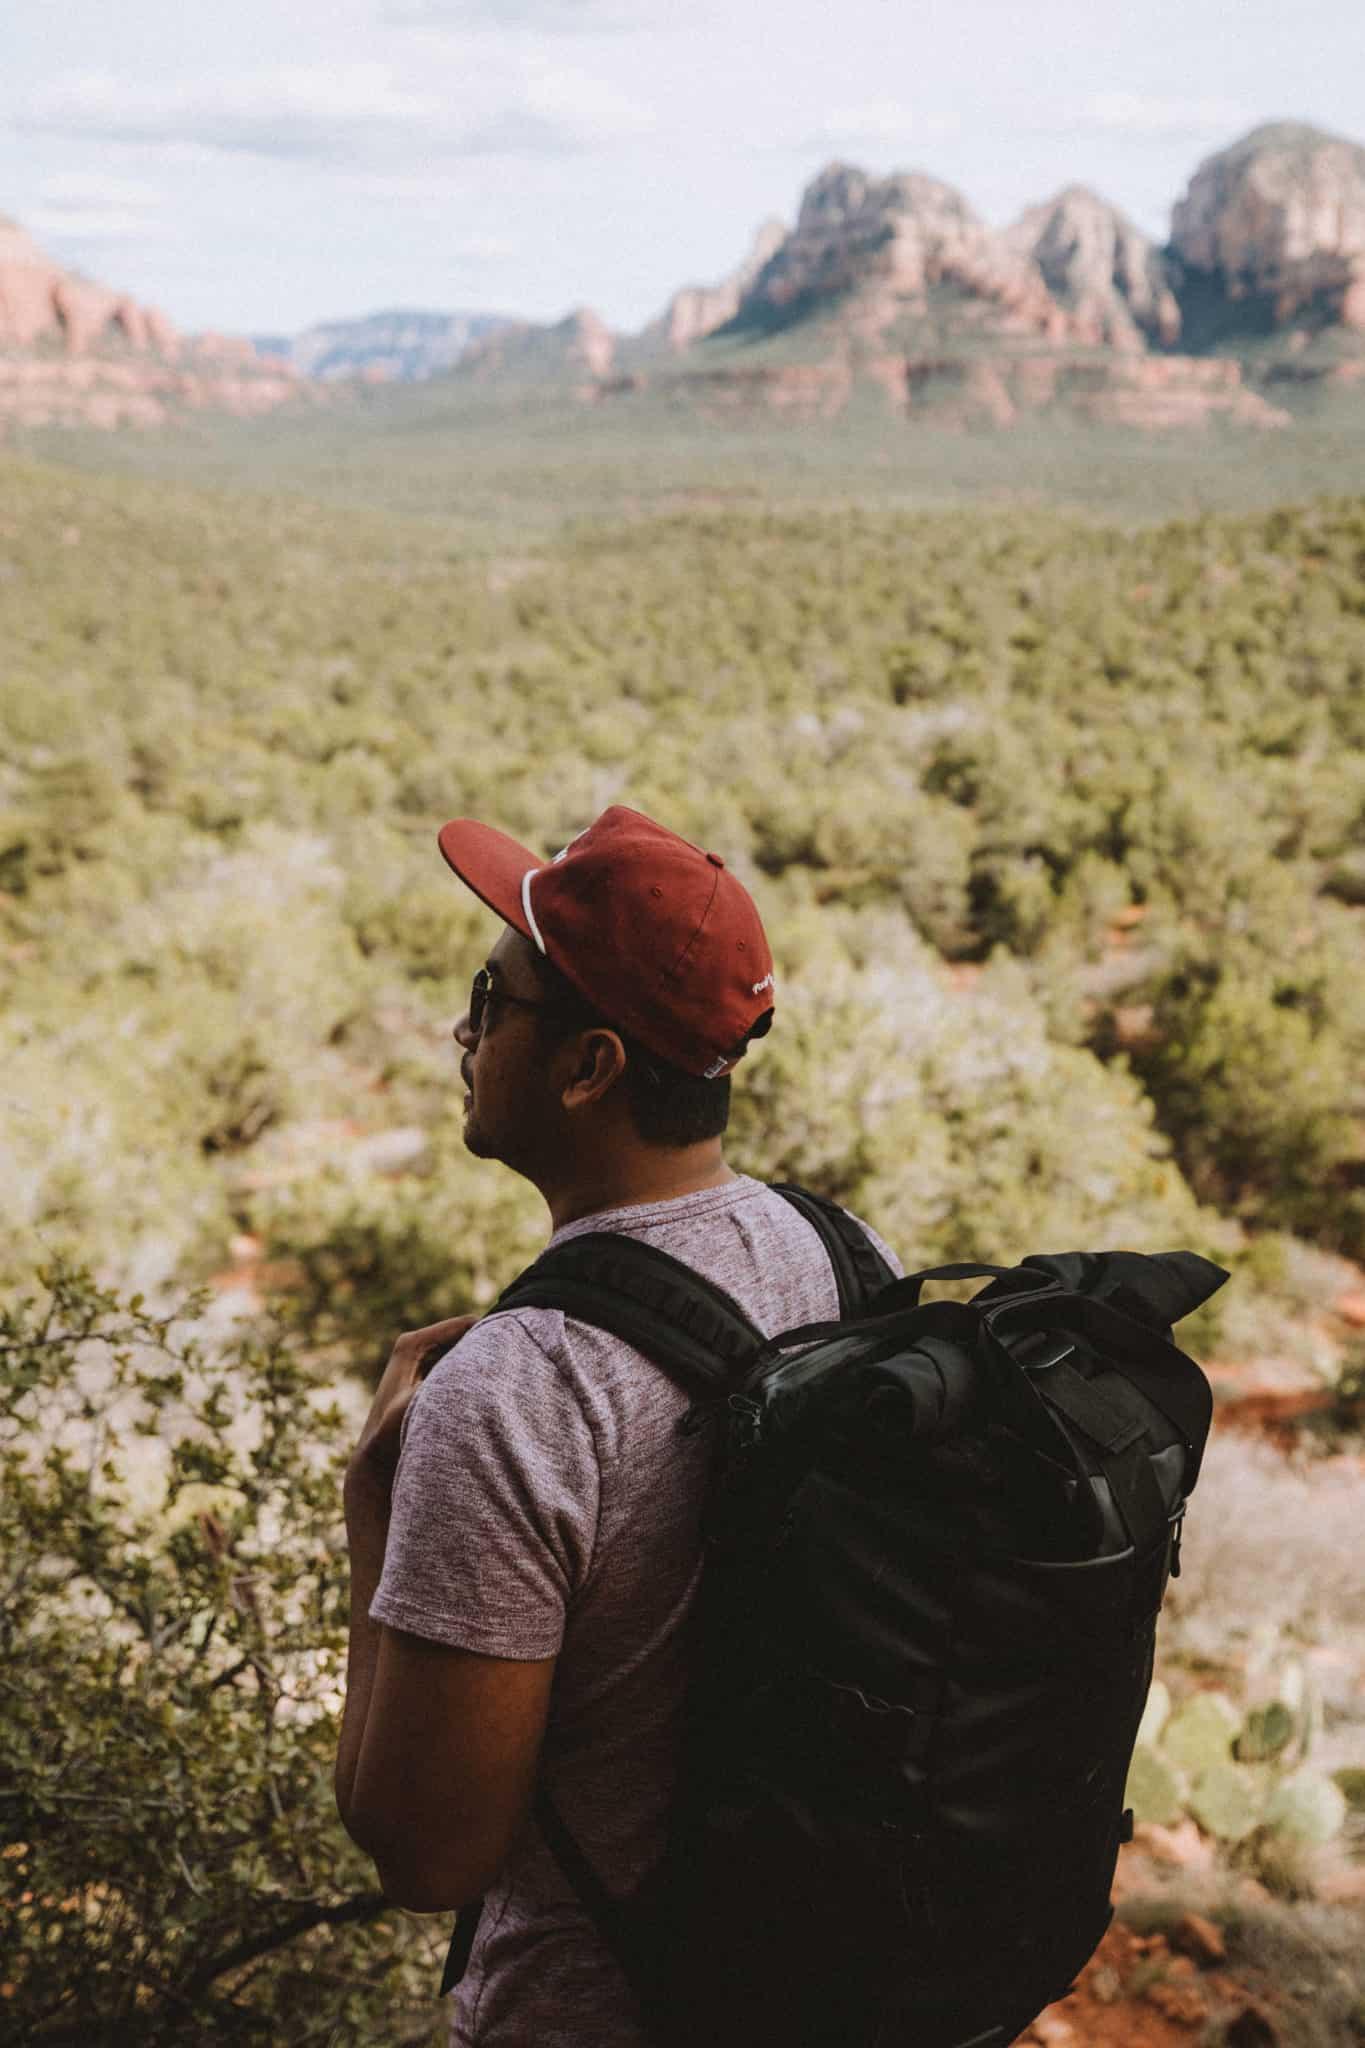 Berty Mandagie looking at Sedona desert view